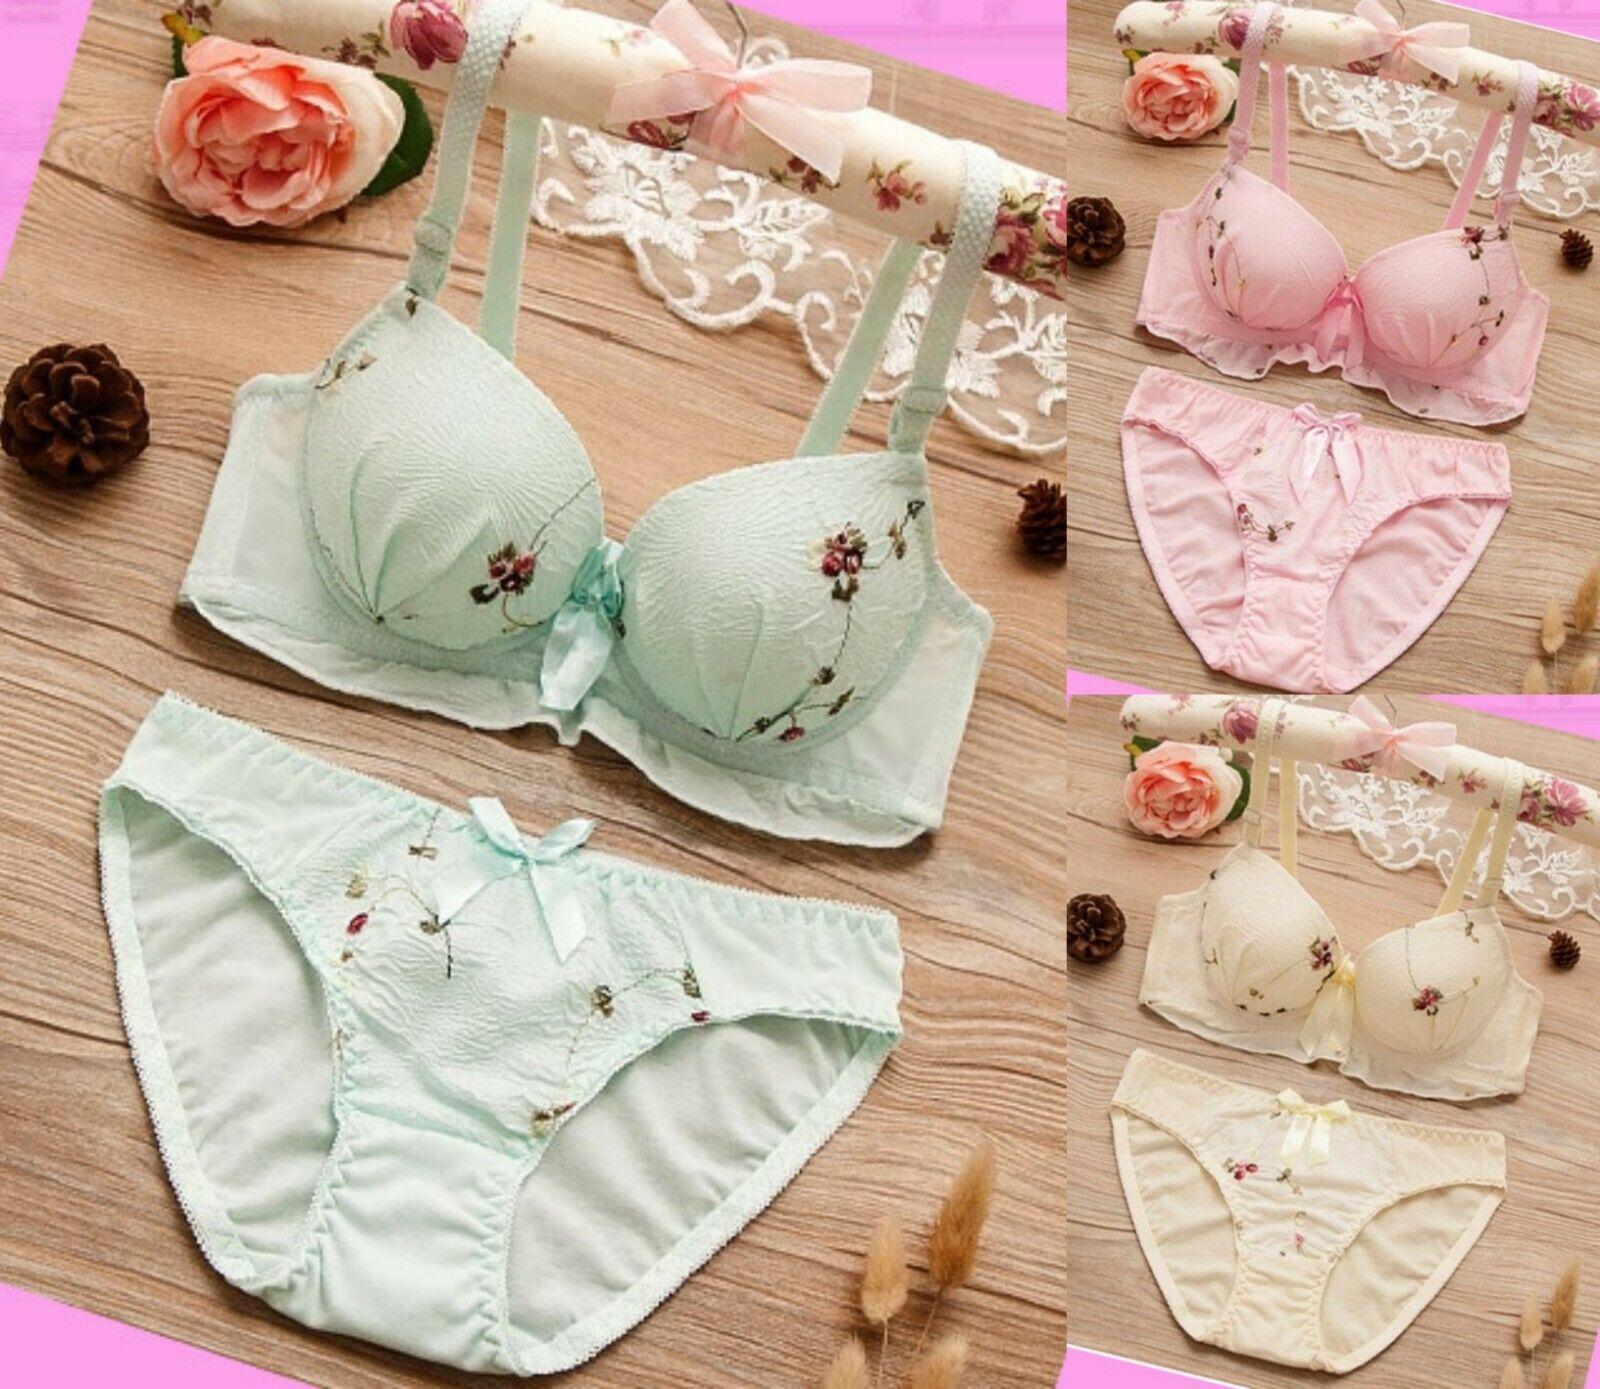 New undies Zootopia Judy Hopps knickers 6 pcs pack Boys Briefs cotton panties